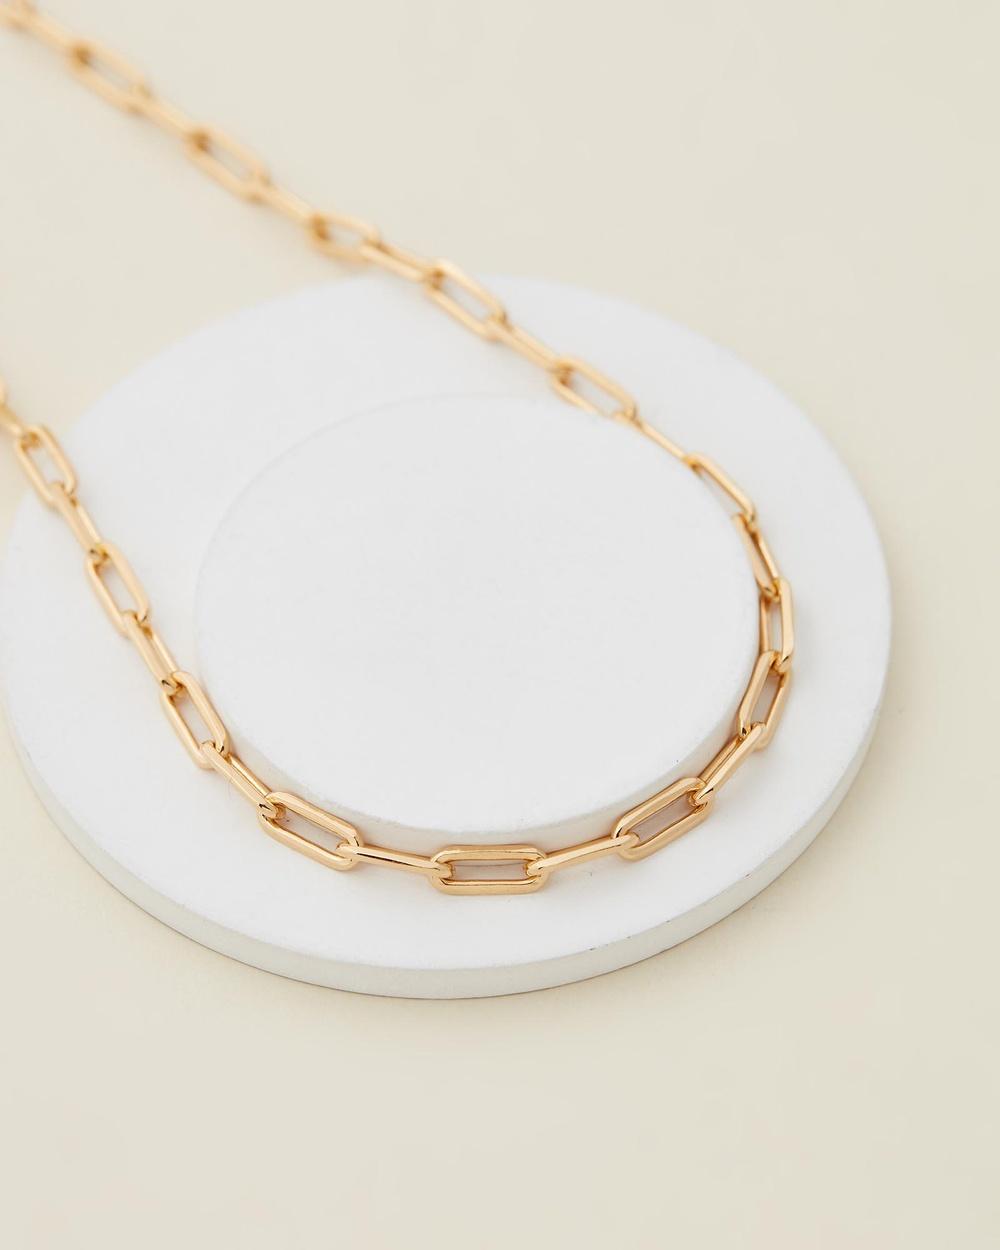 Jackie Mack Mar Necklace Jewellery 18k Yellow Gold Vermeil